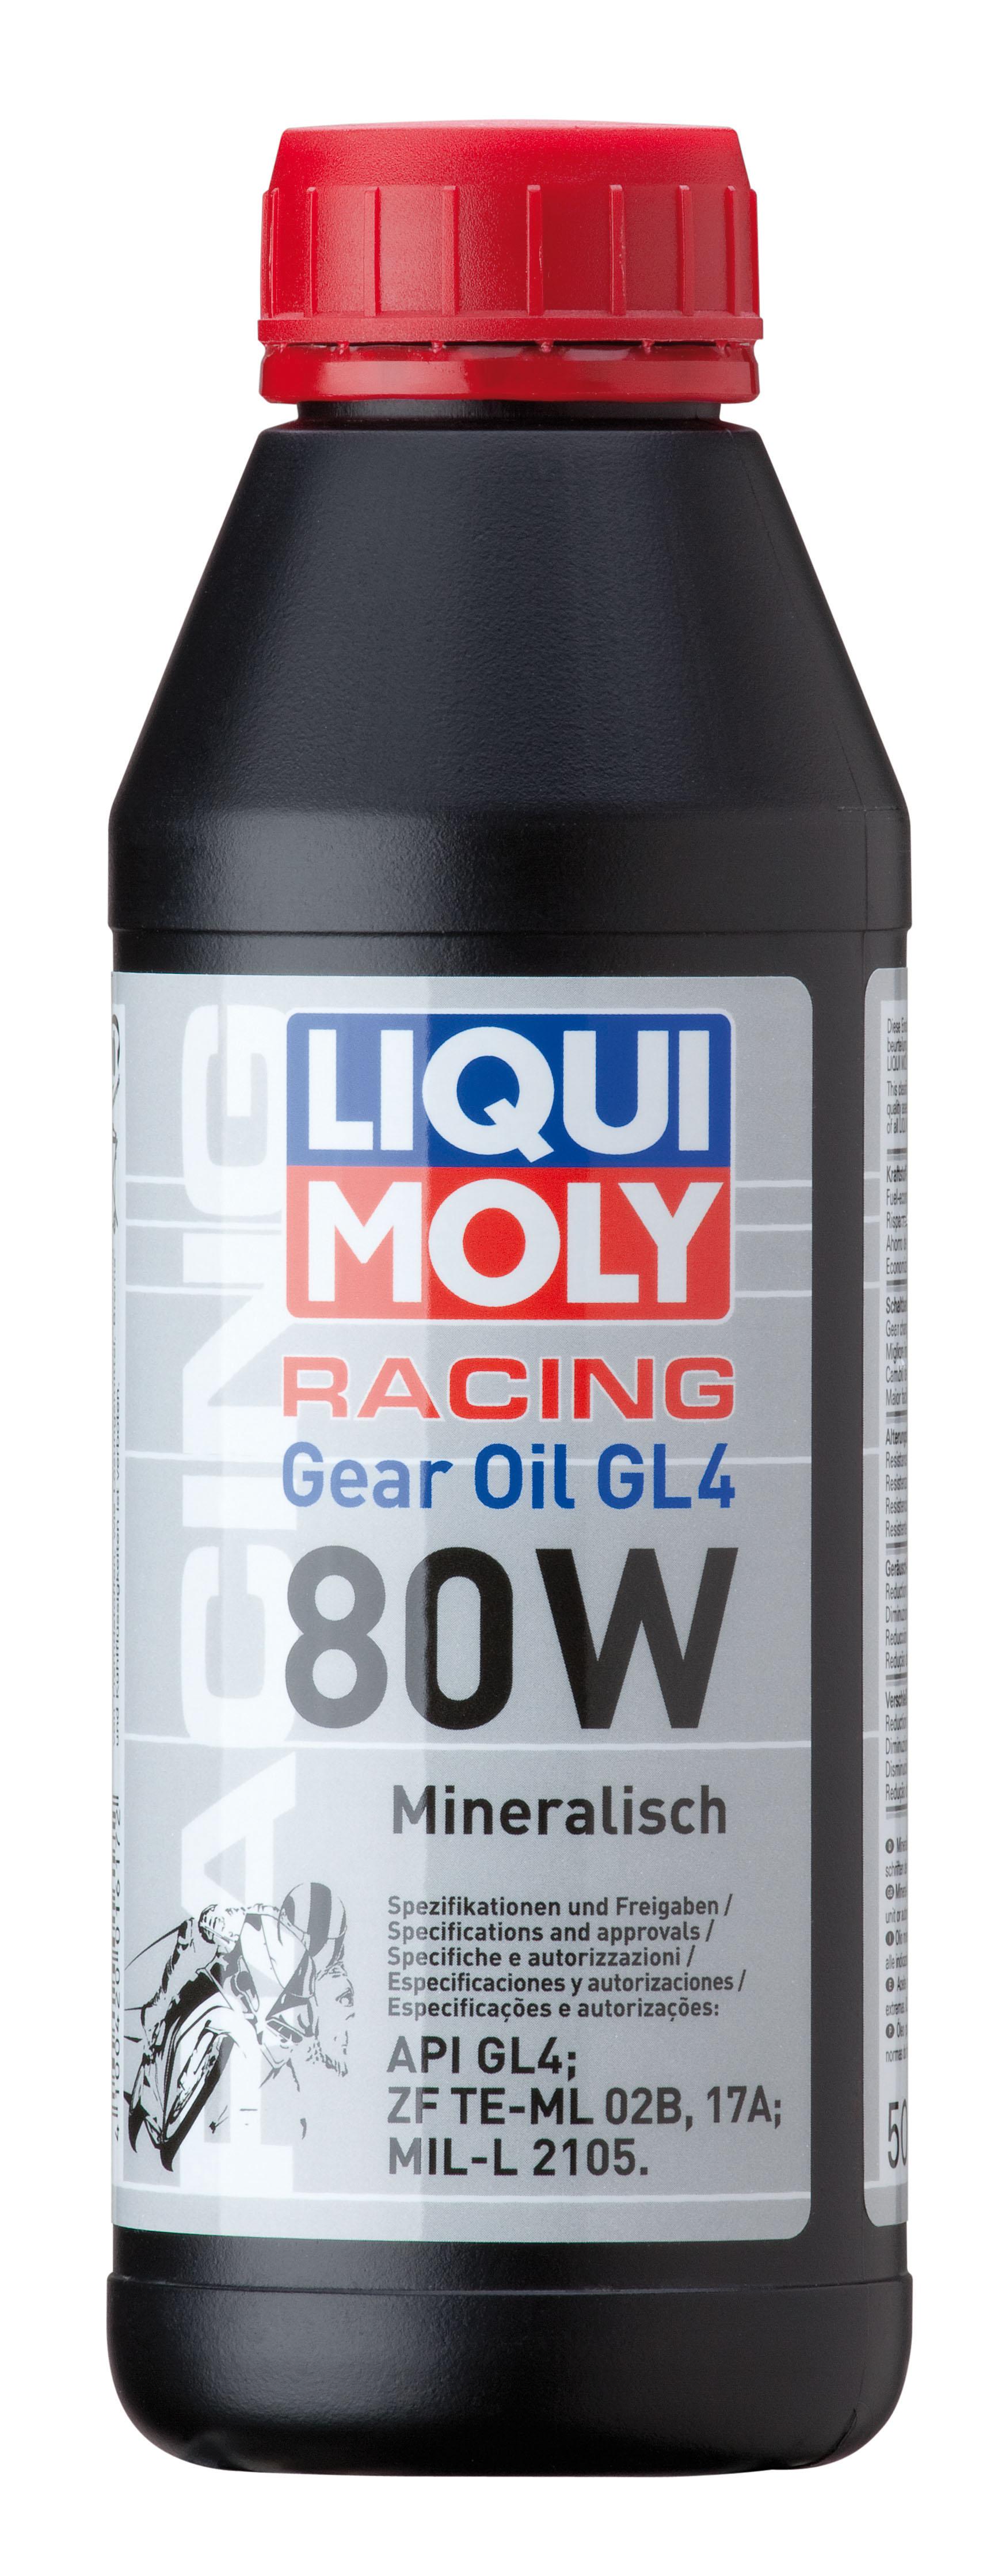 motorbike gear oil 80w liqui moly motoroel king. Black Bedroom Furniture Sets. Home Design Ideas